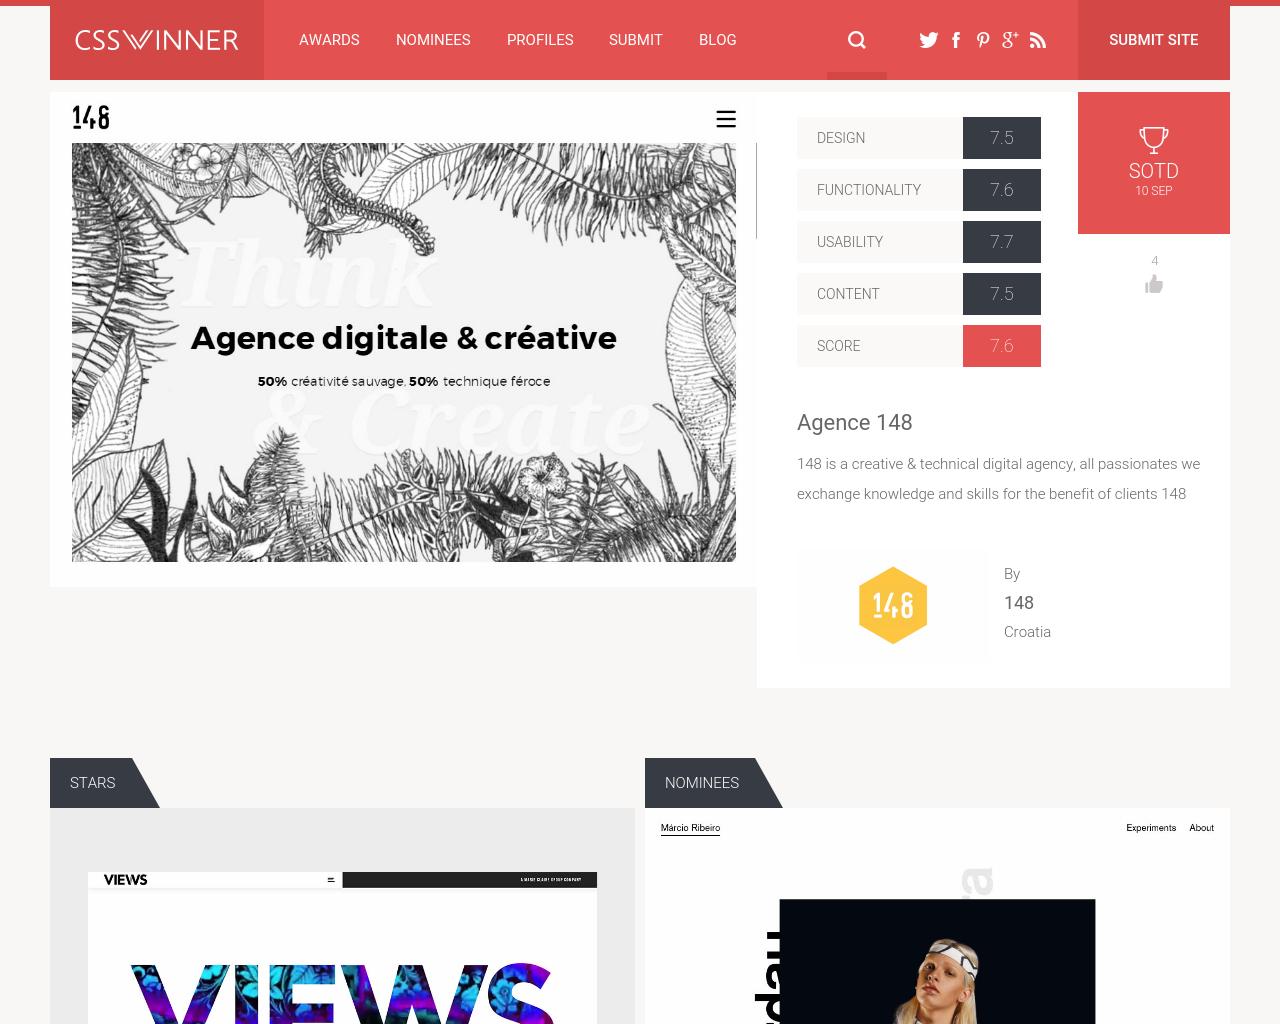 CSSWINNER-Advertising-Reviews-Pricing